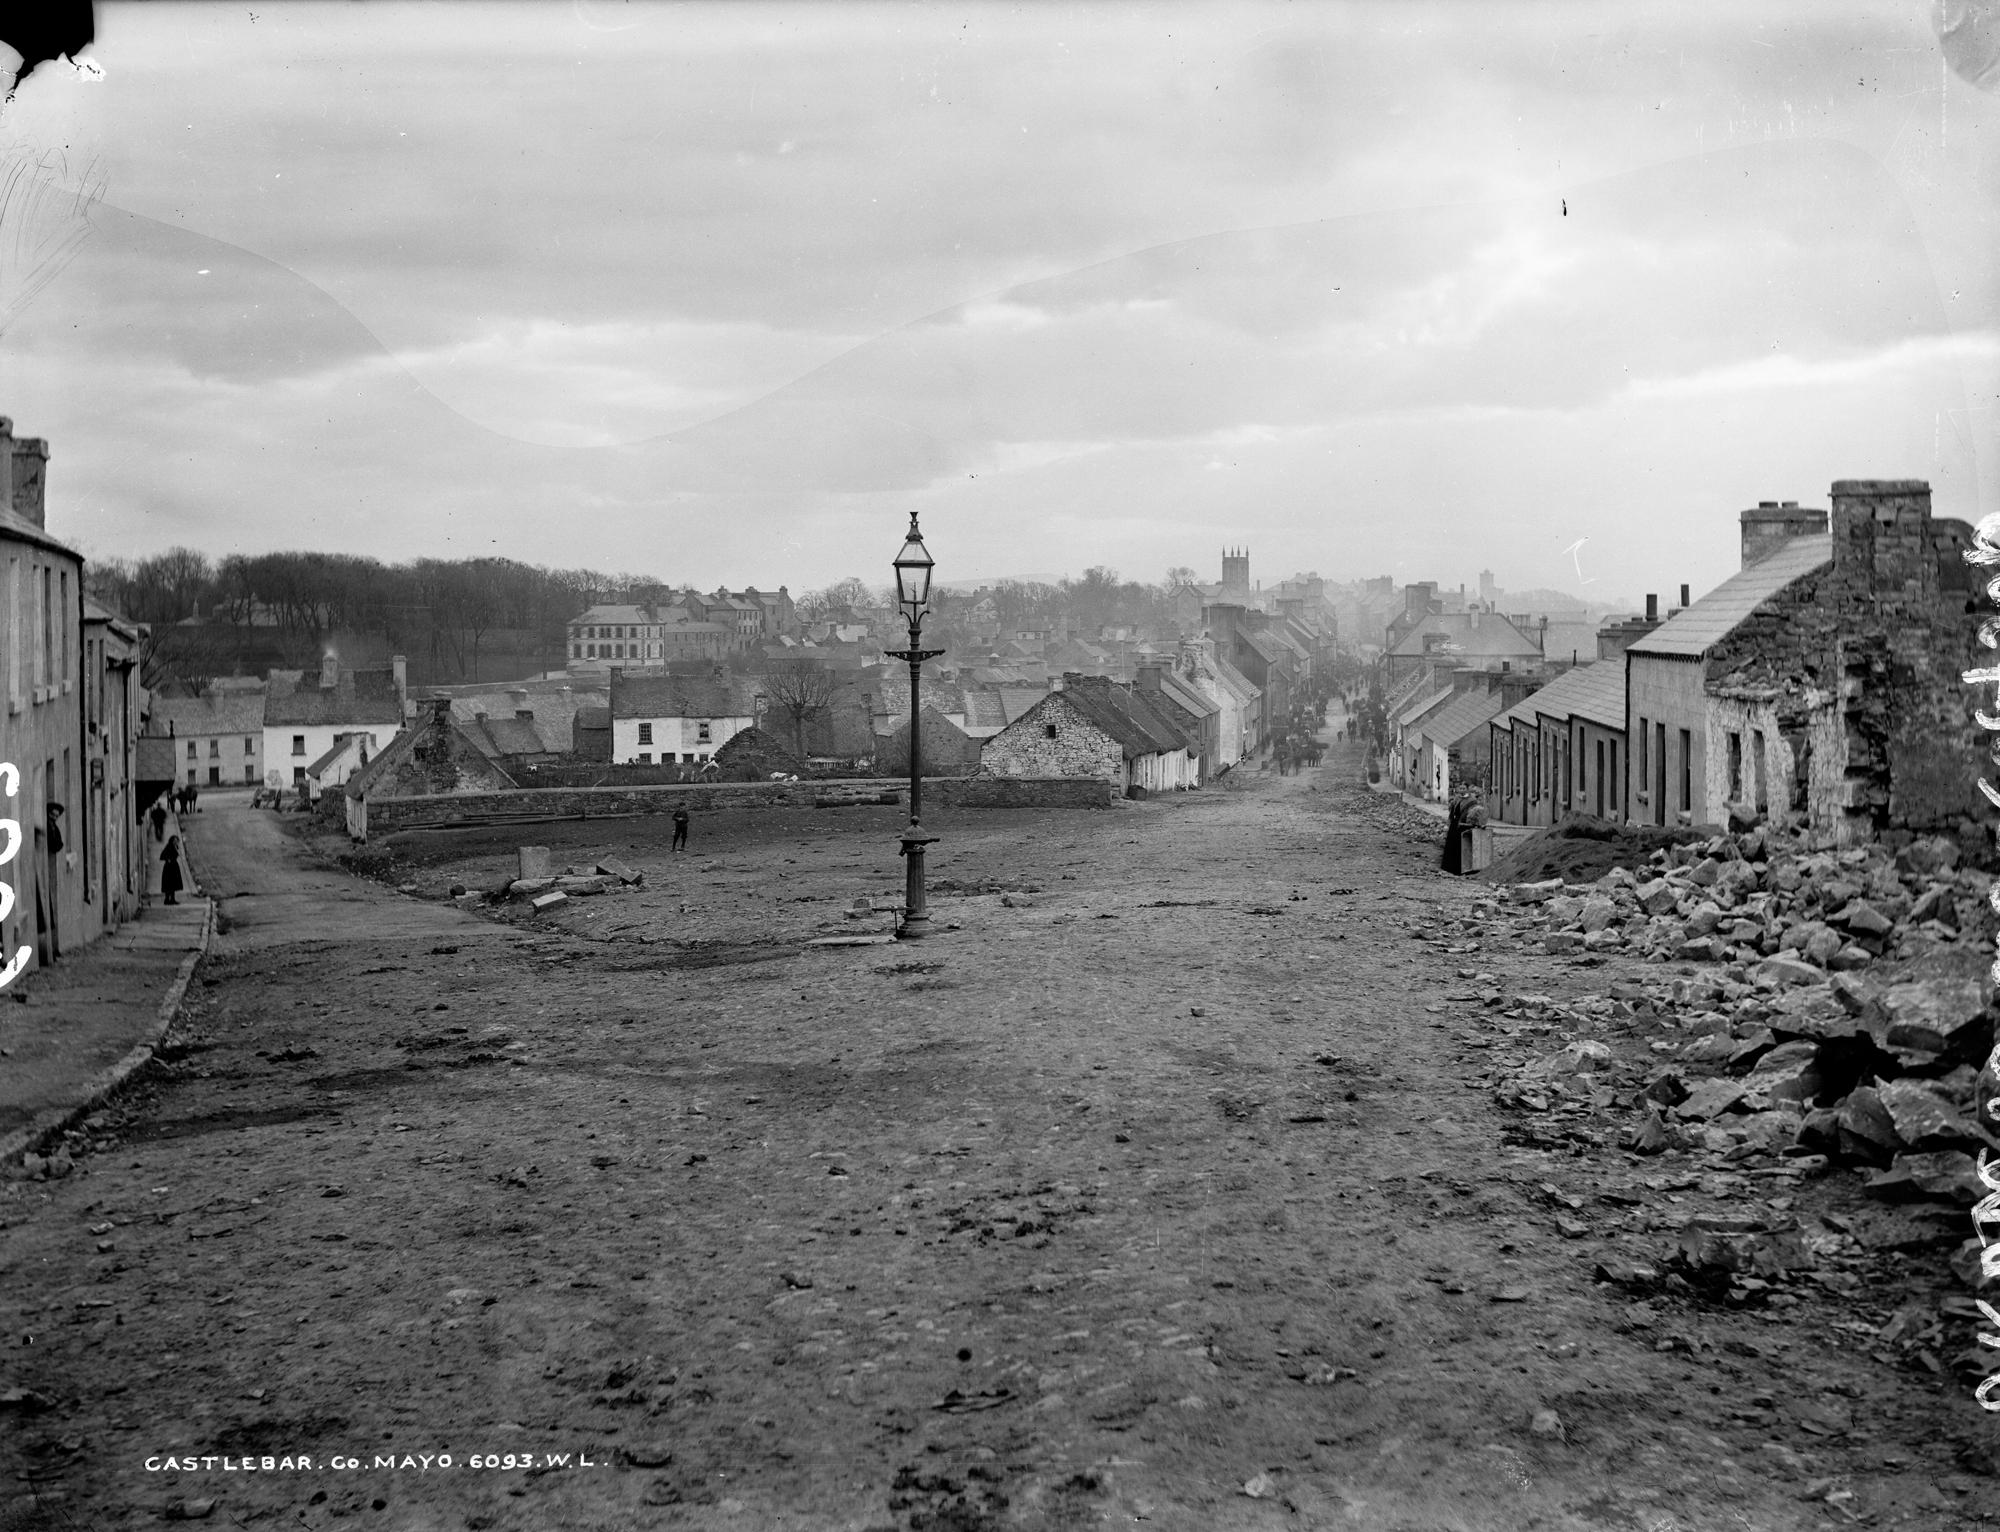 Rebuilding Castlebar, Co. Mayo